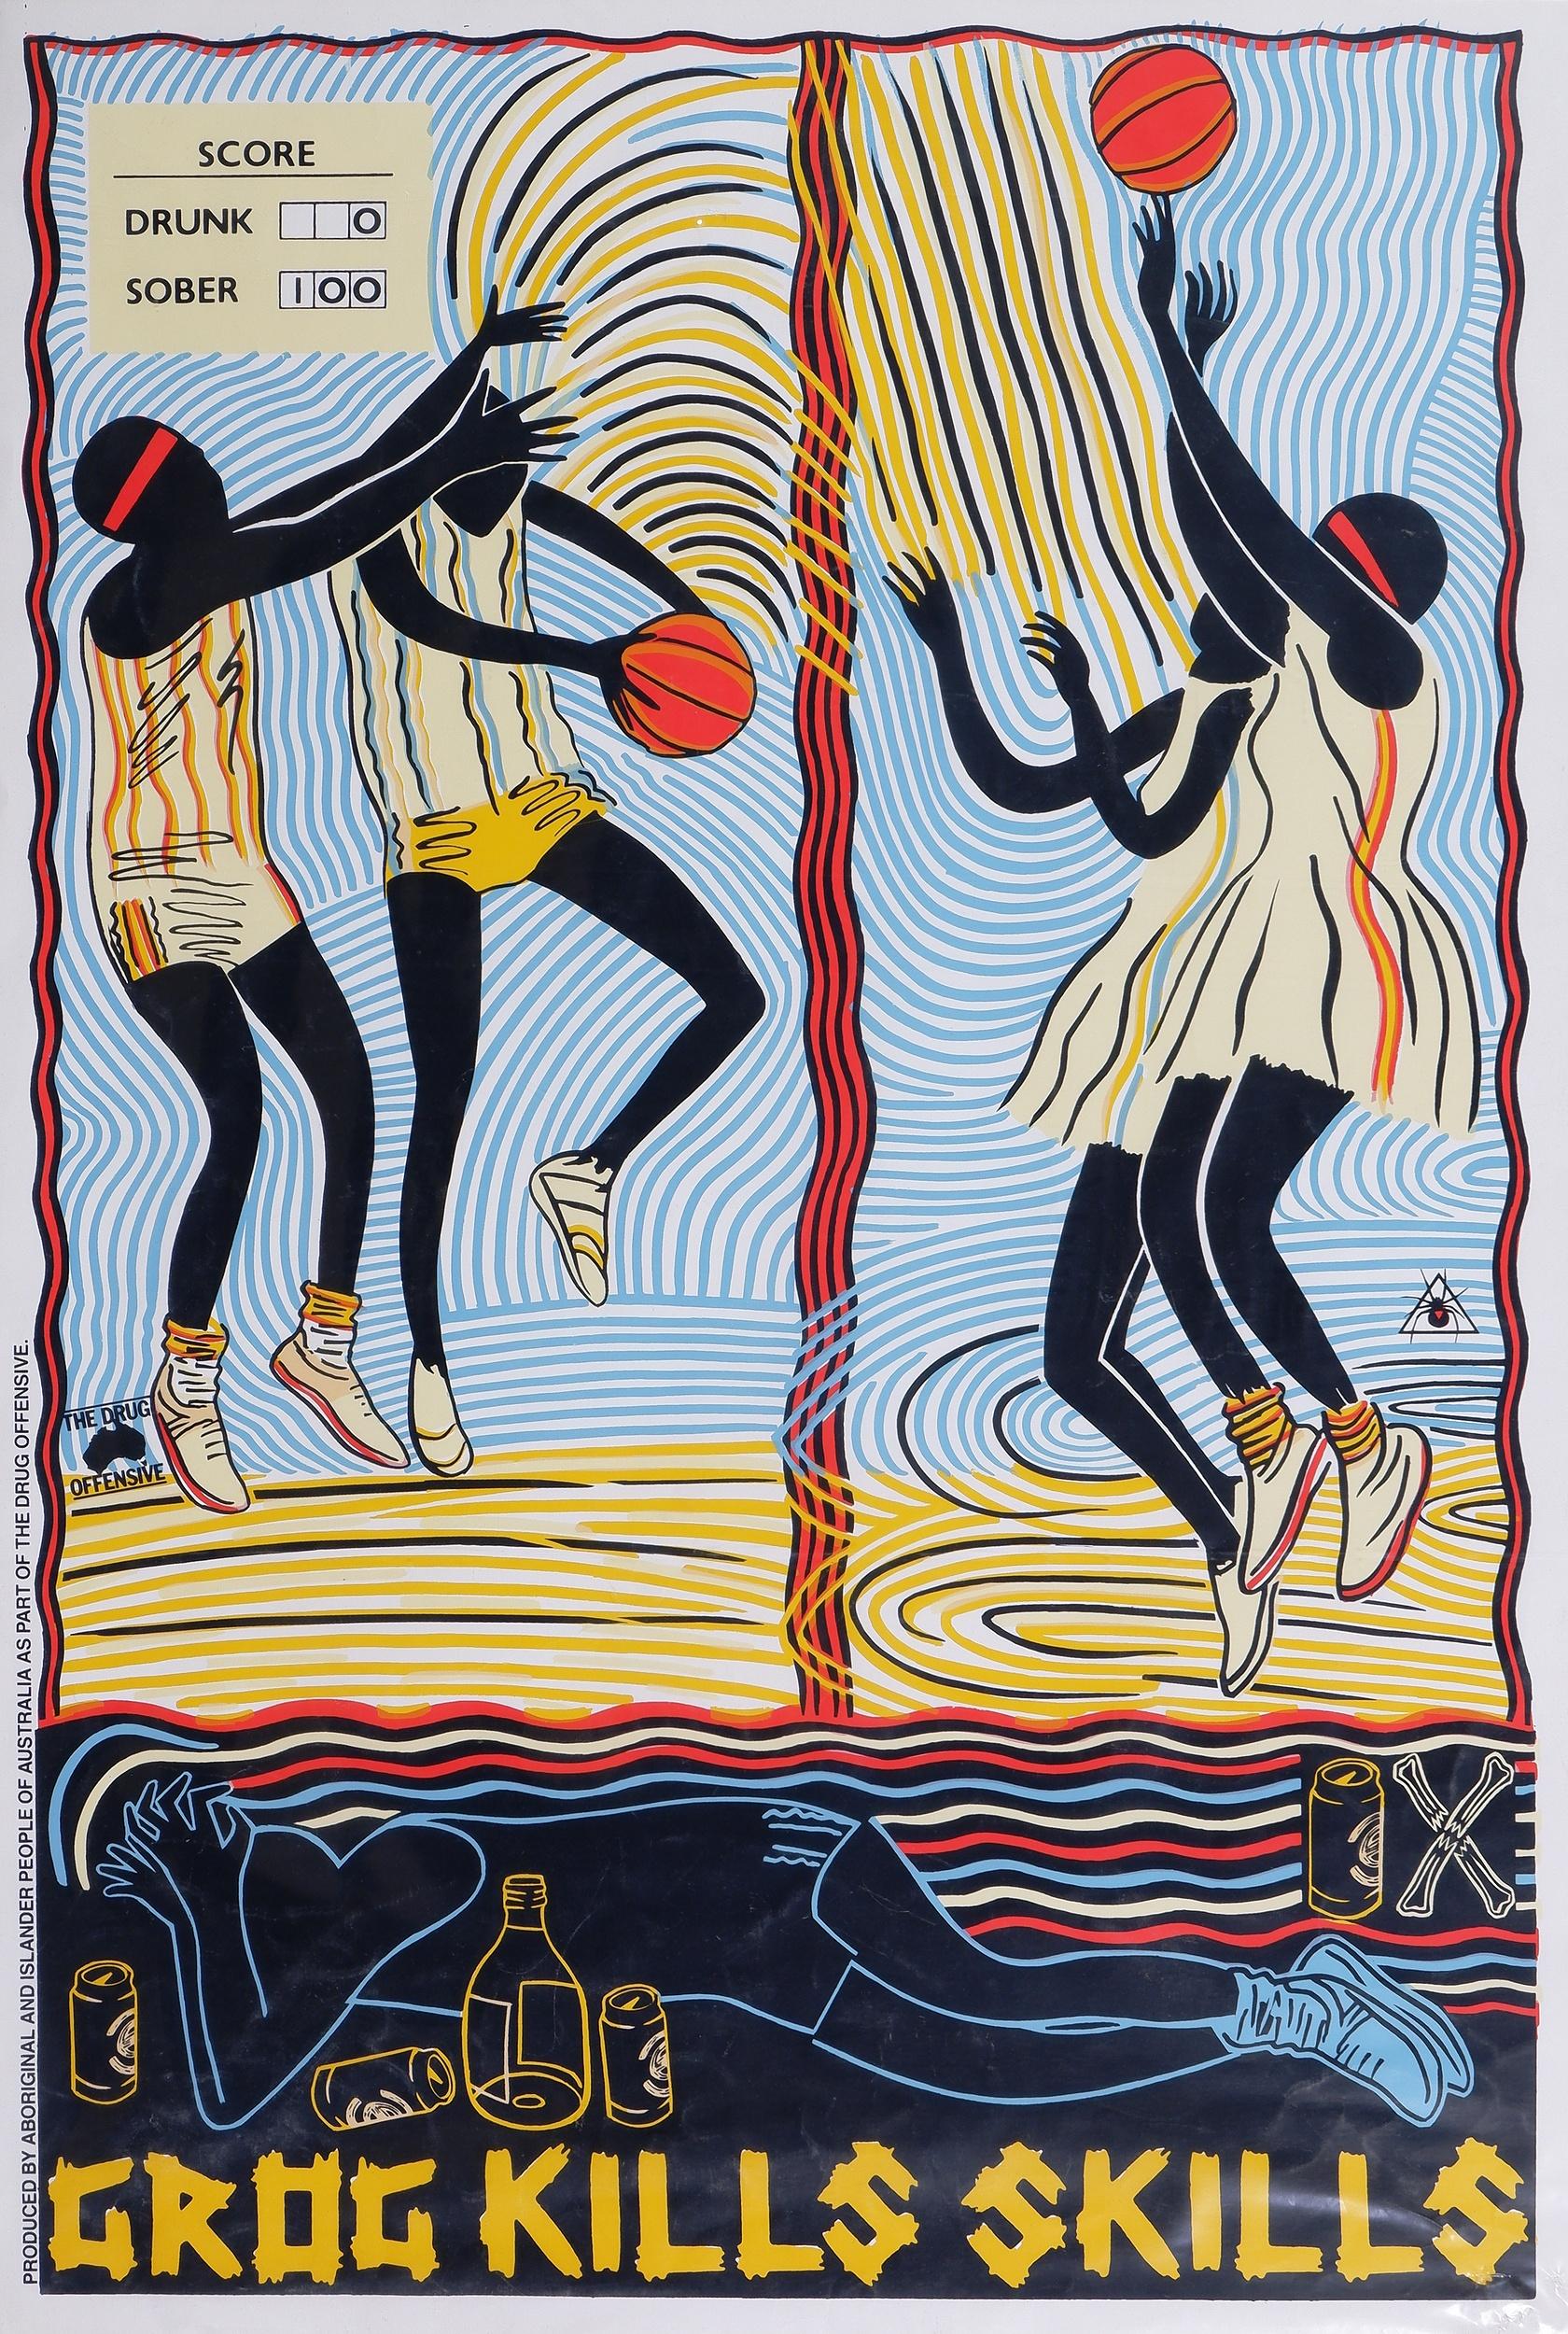 'Marie McMahon (born 1953), Grog Kills Skills, Basketball 1988, Colour Screenprint'